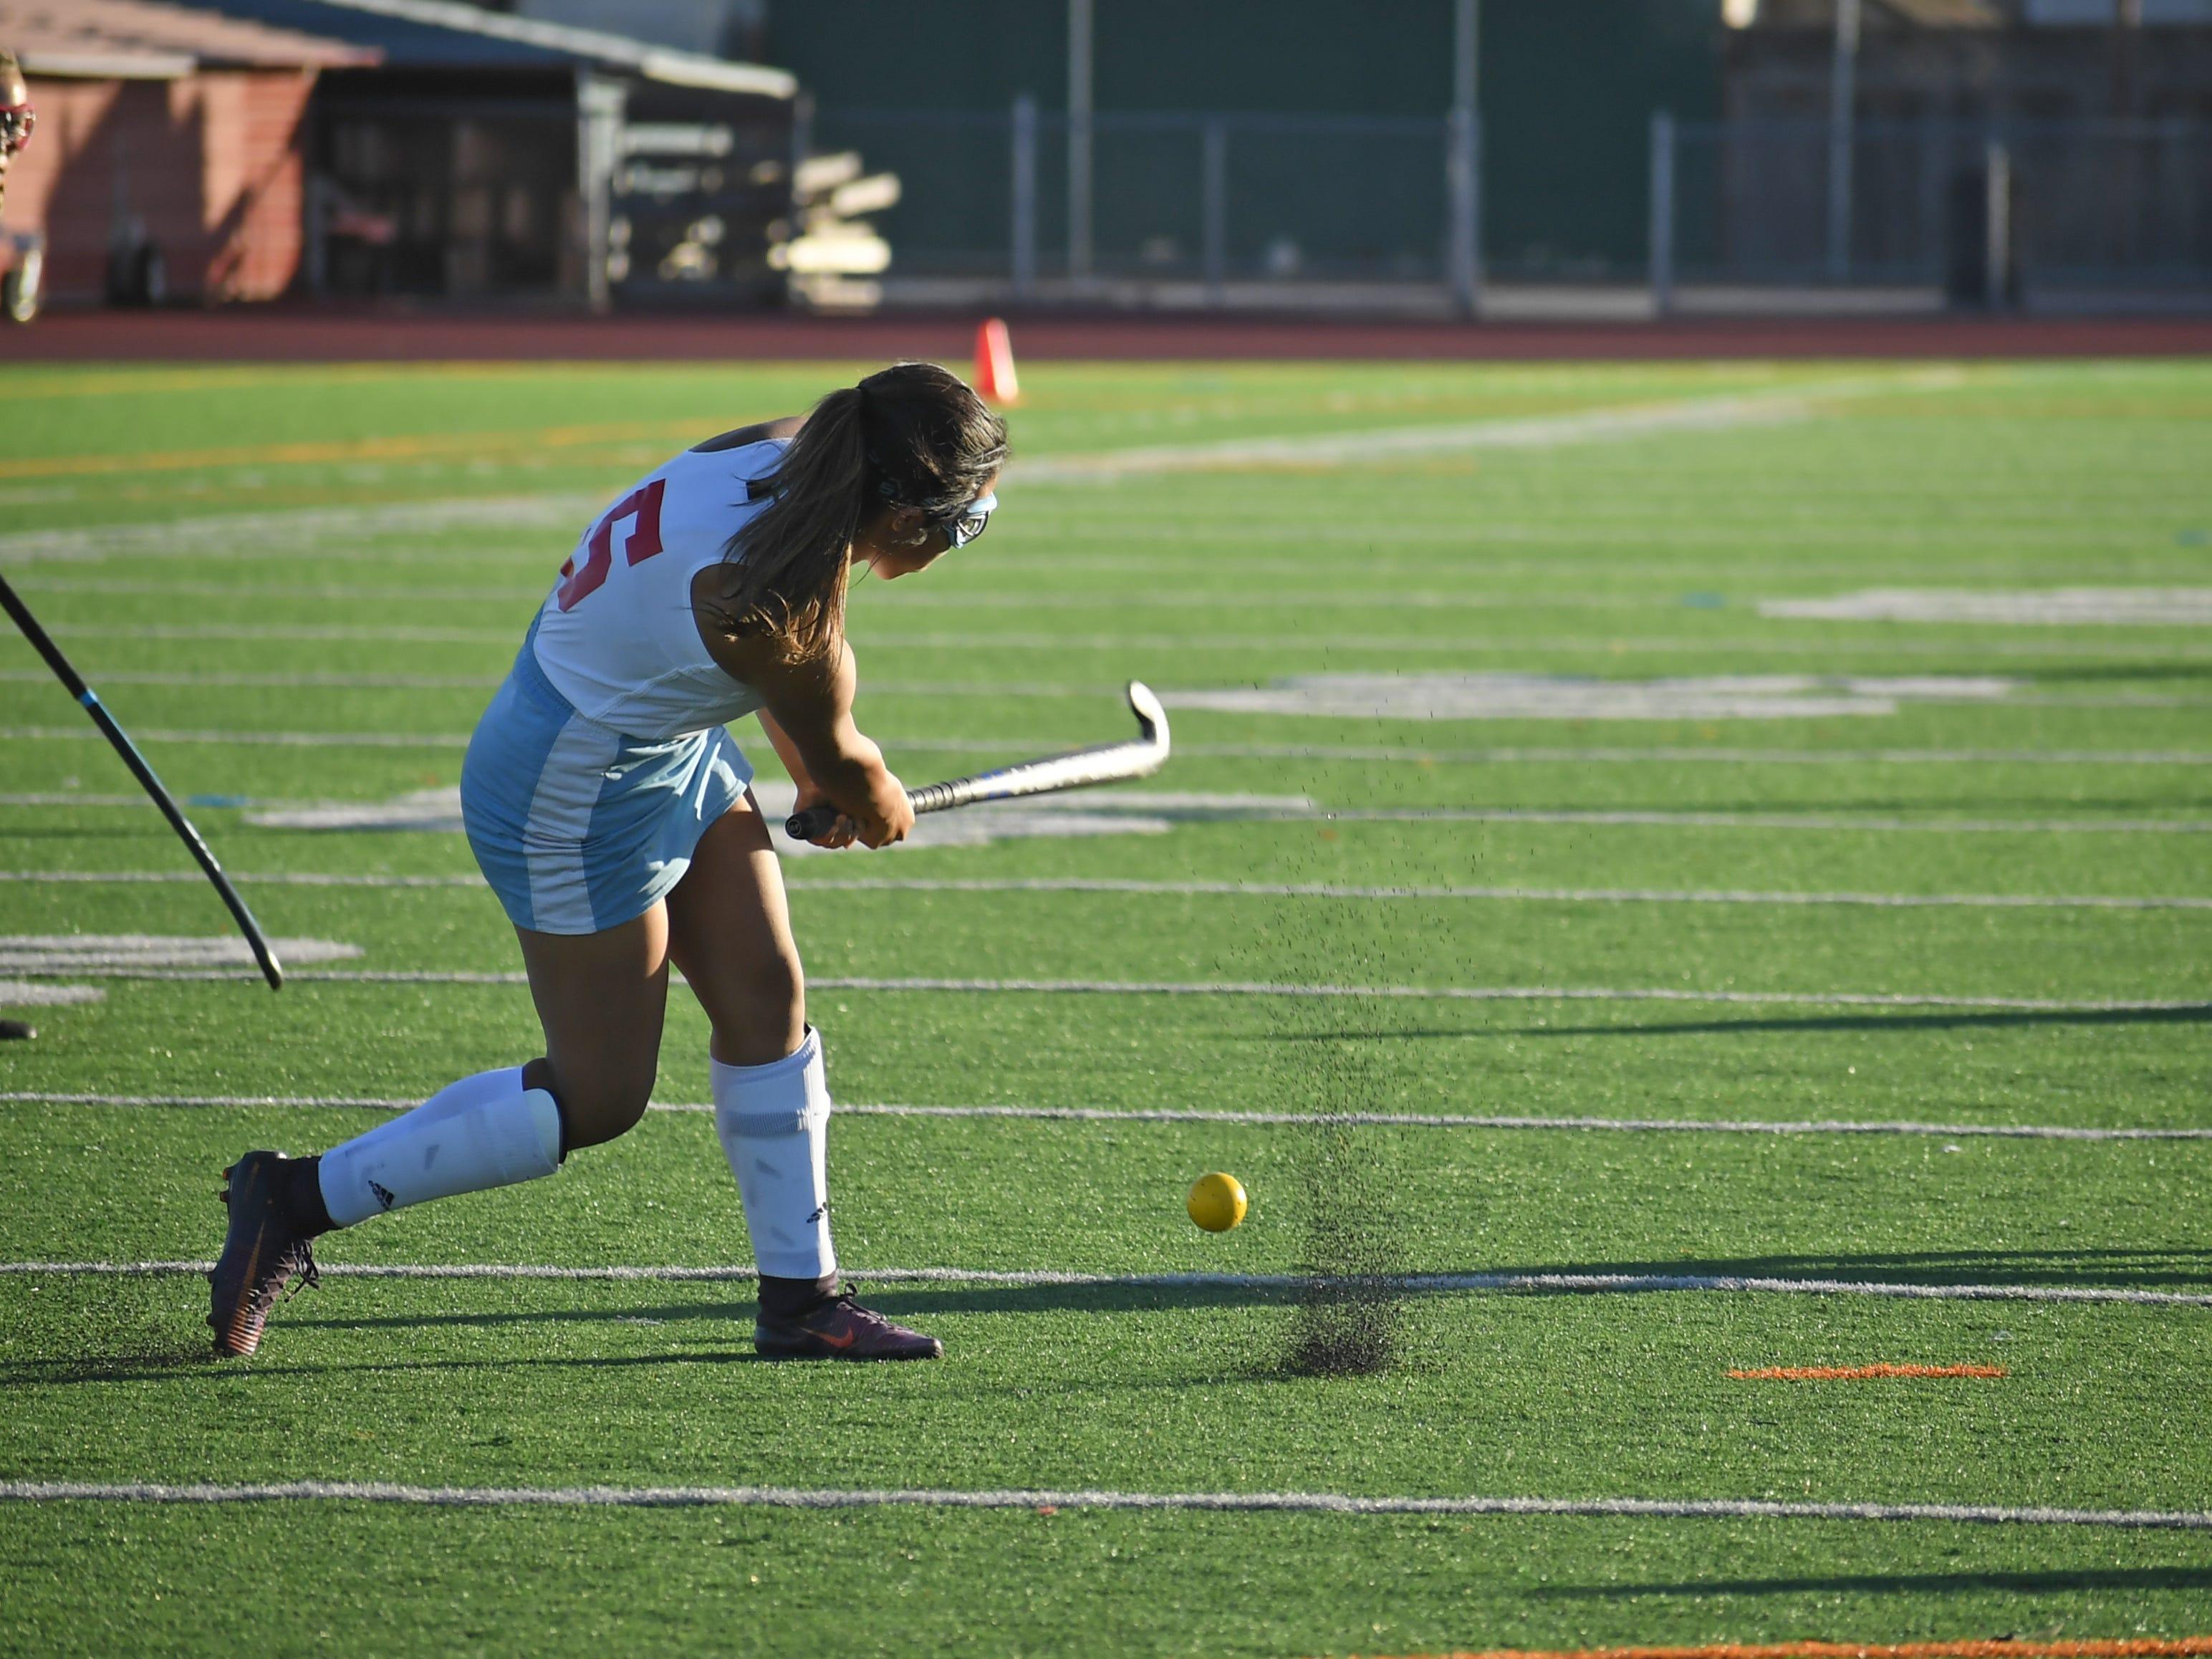 Midfielder Samantha Herrera (5) fires a shot downfield towards Natalia Cardenas.